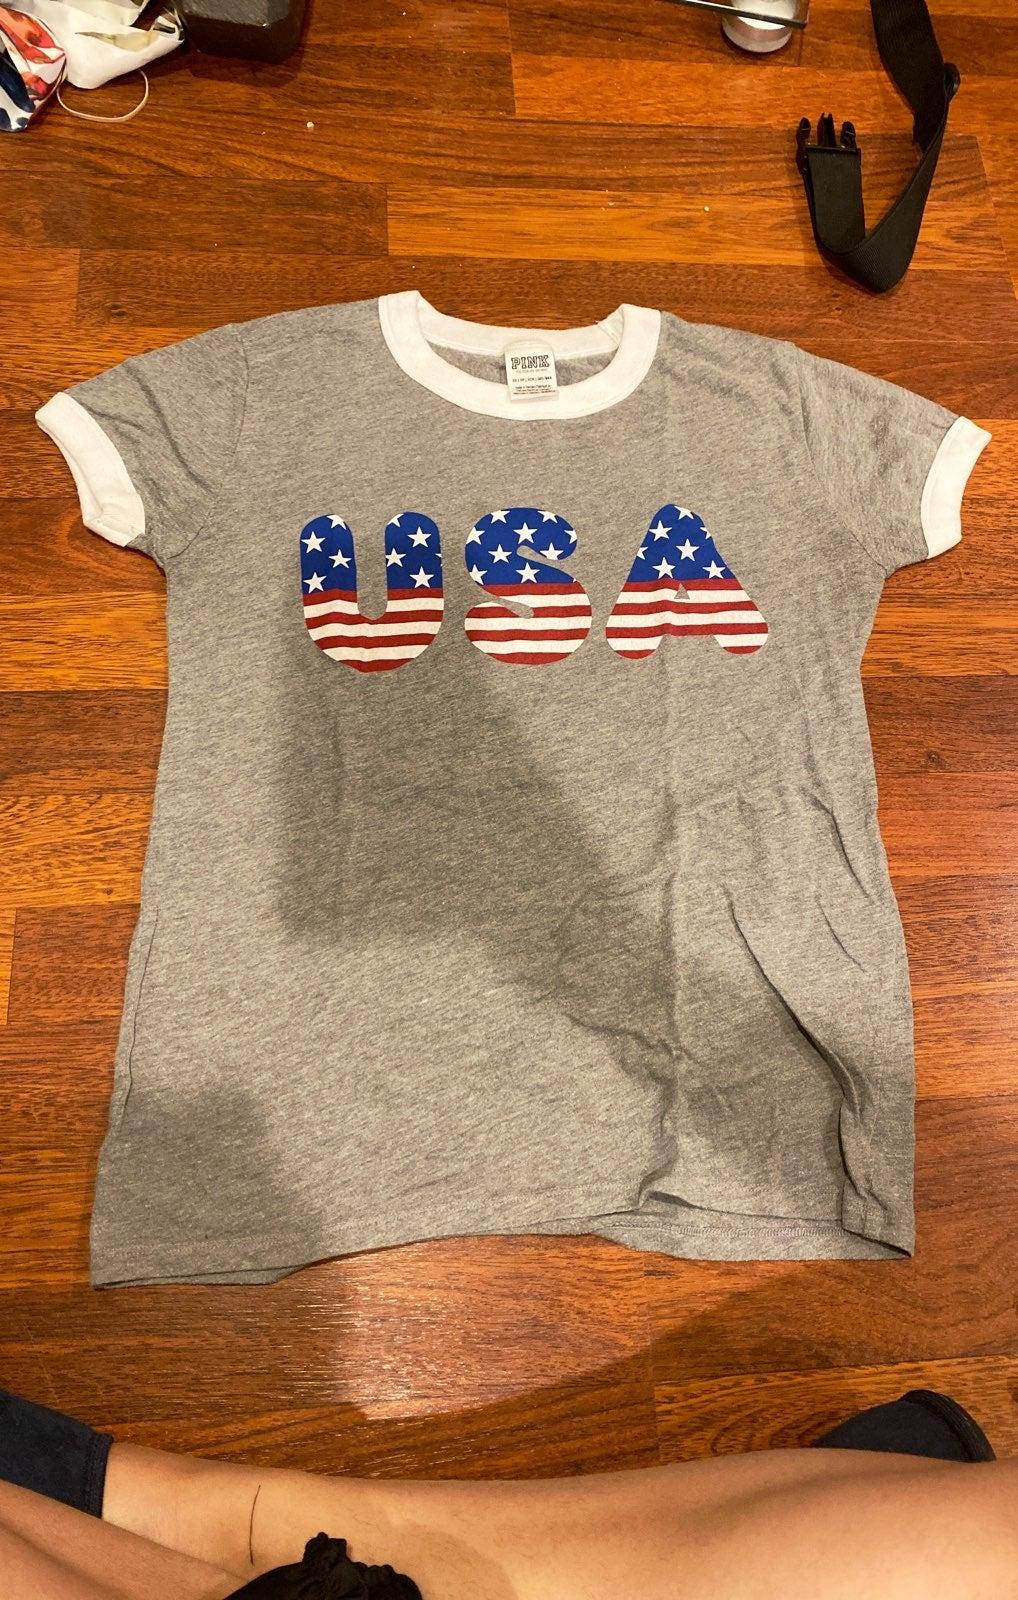 PINK USA shirt